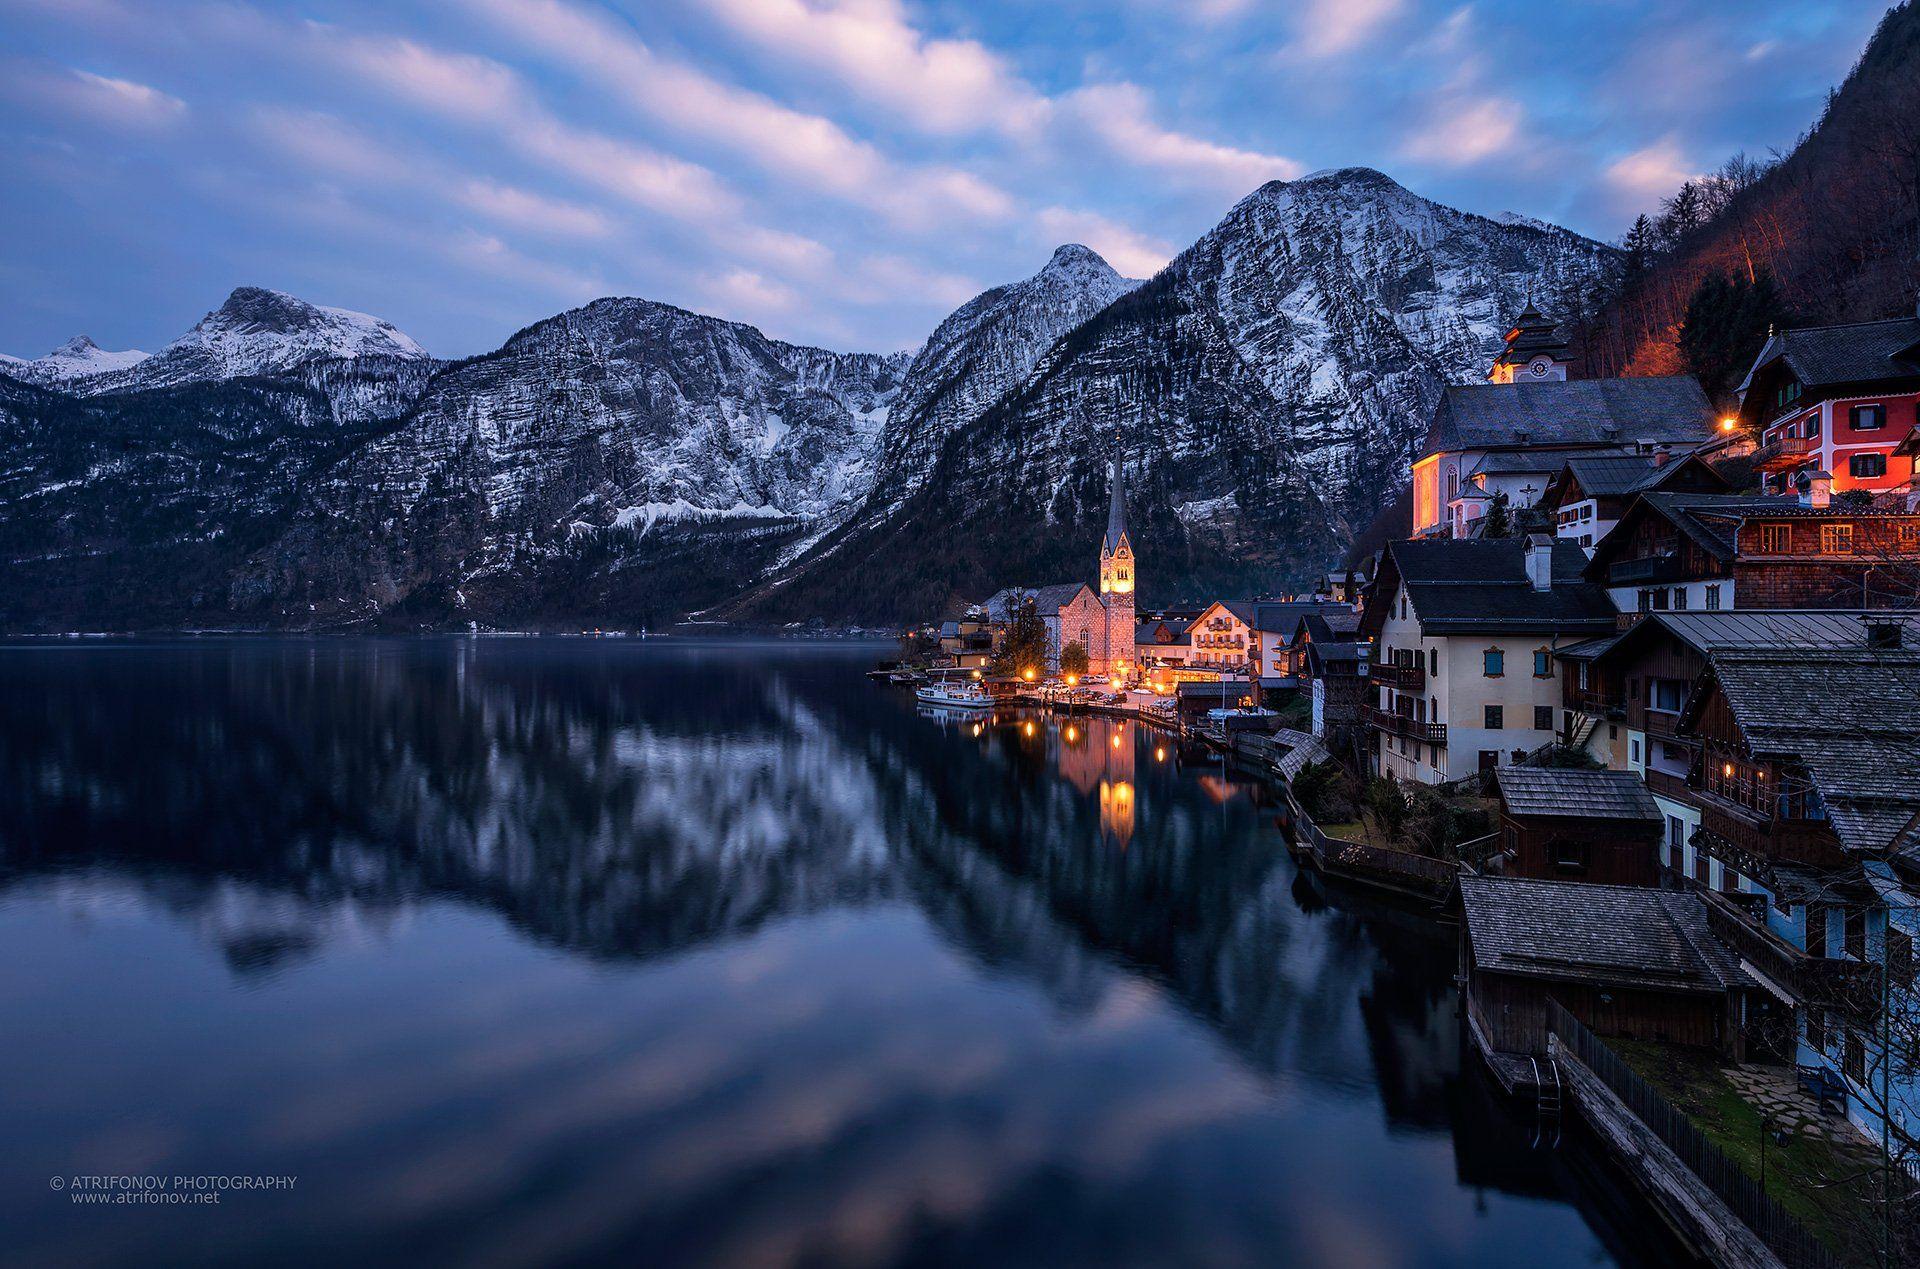 Hallstatt, Austria, Upper Austria, village, Alps, mountains, lake, lights, cityscape, time blending, church, reflections, water, snow, winter, Andrey Trifonov